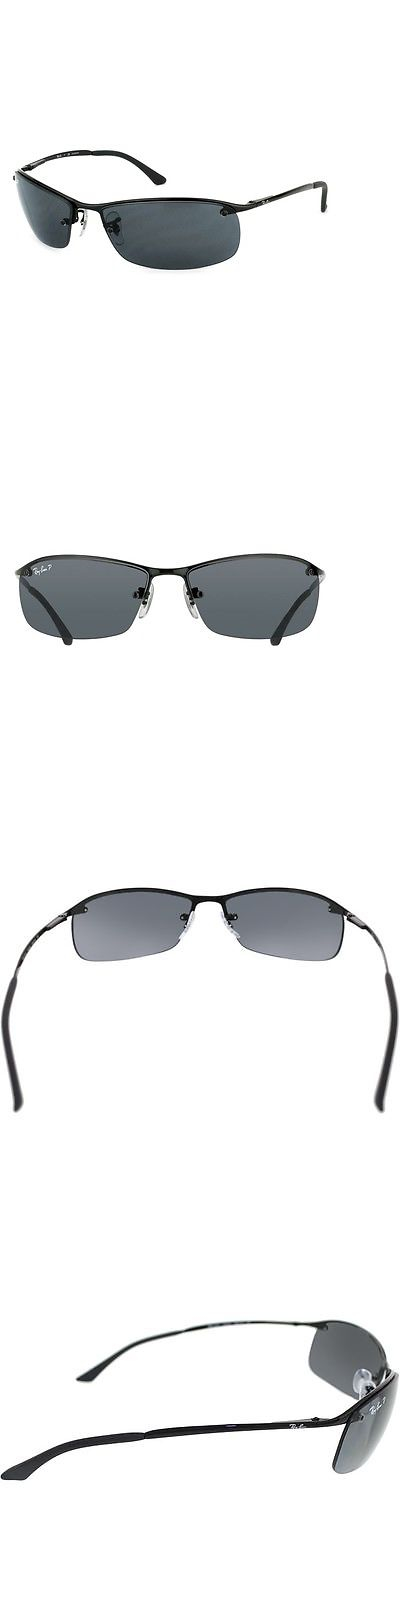 Sunglasses 155189: Ray-Ban Rb3183 002 81 Black Frame Polarized Grey ...